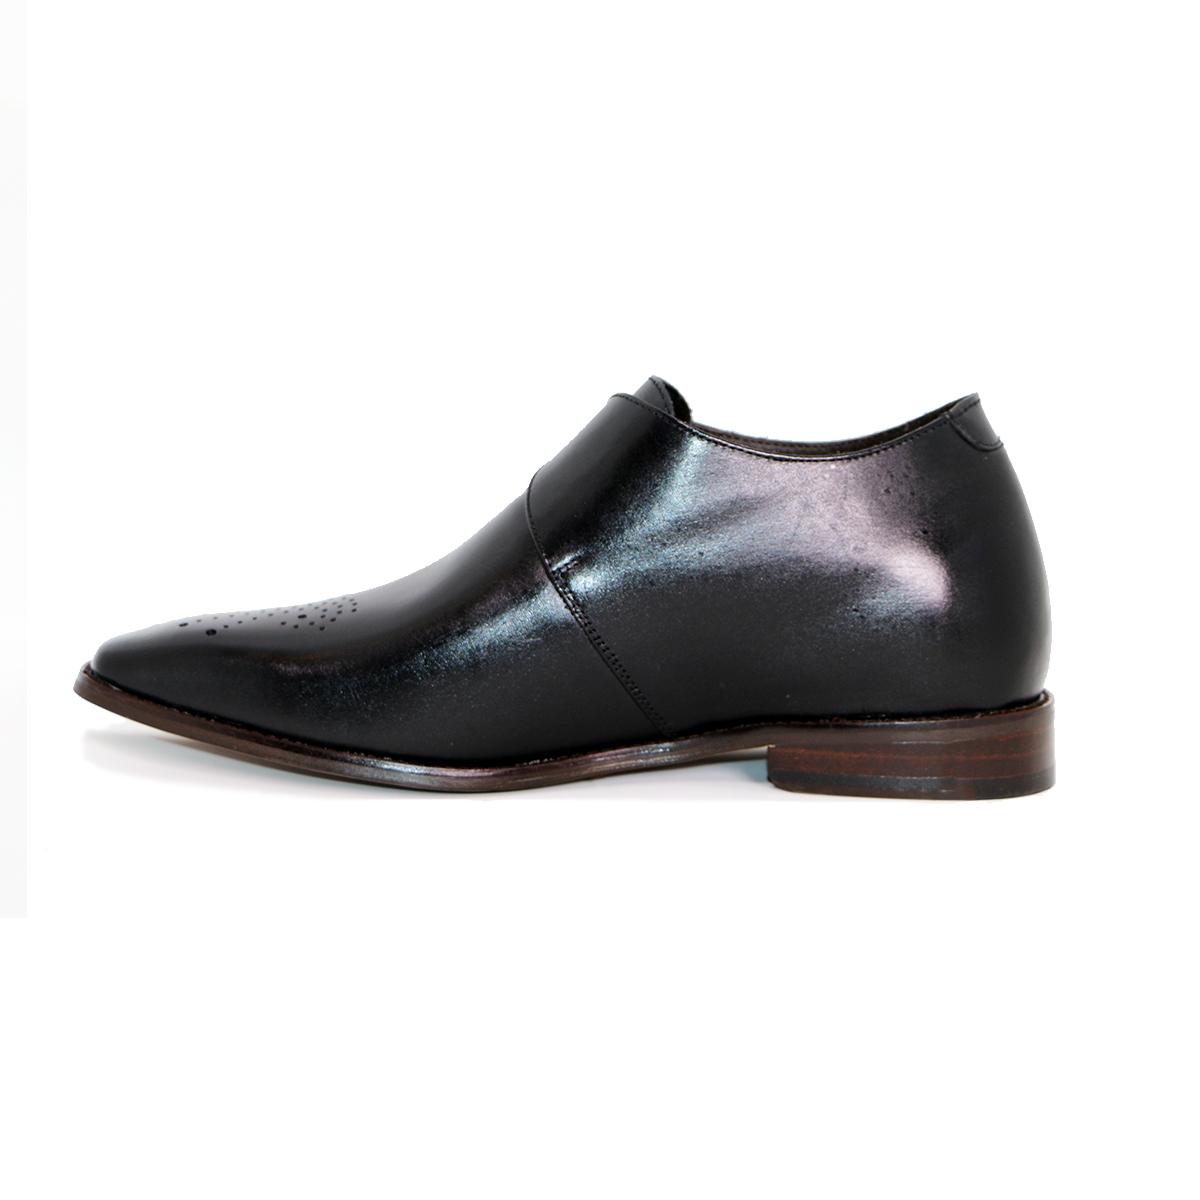 Zapato Formal Gentleman Negro Max Denegri +7cms De Altura_72724